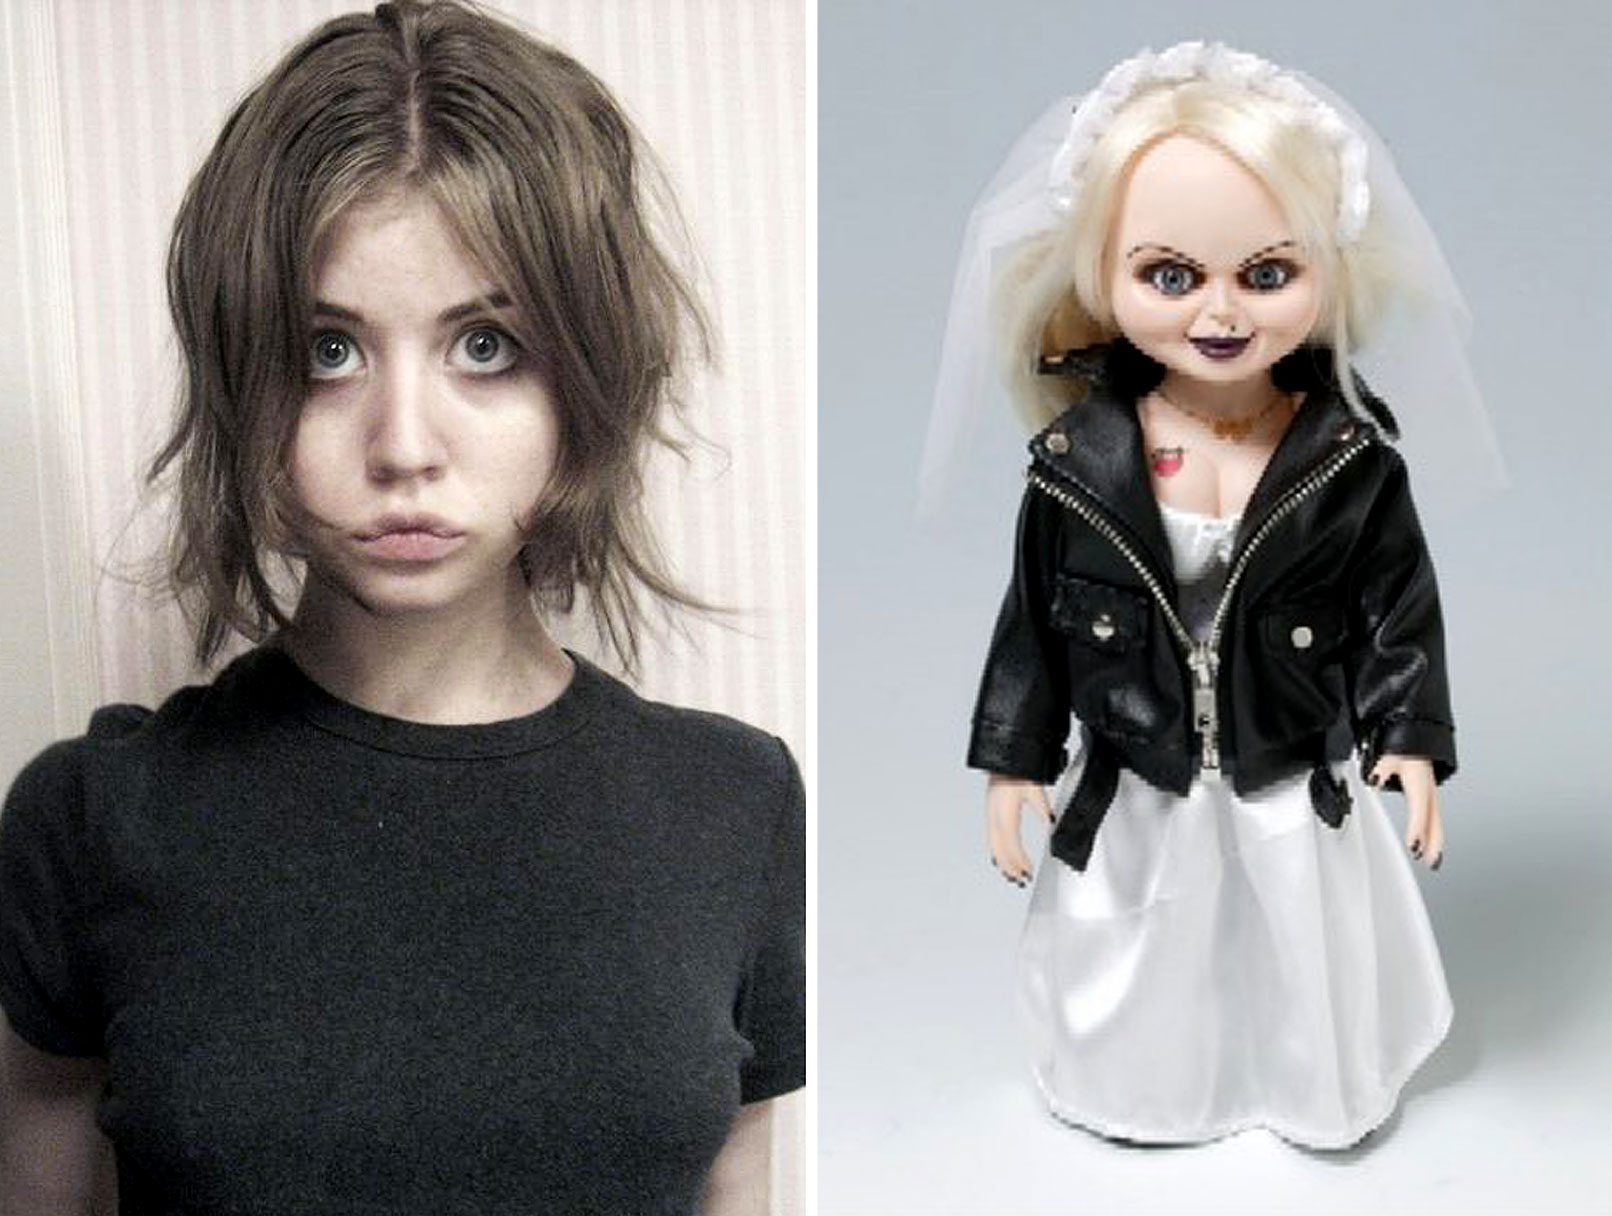 Top Model Allison Harvard Is…the Bride of Chucky!